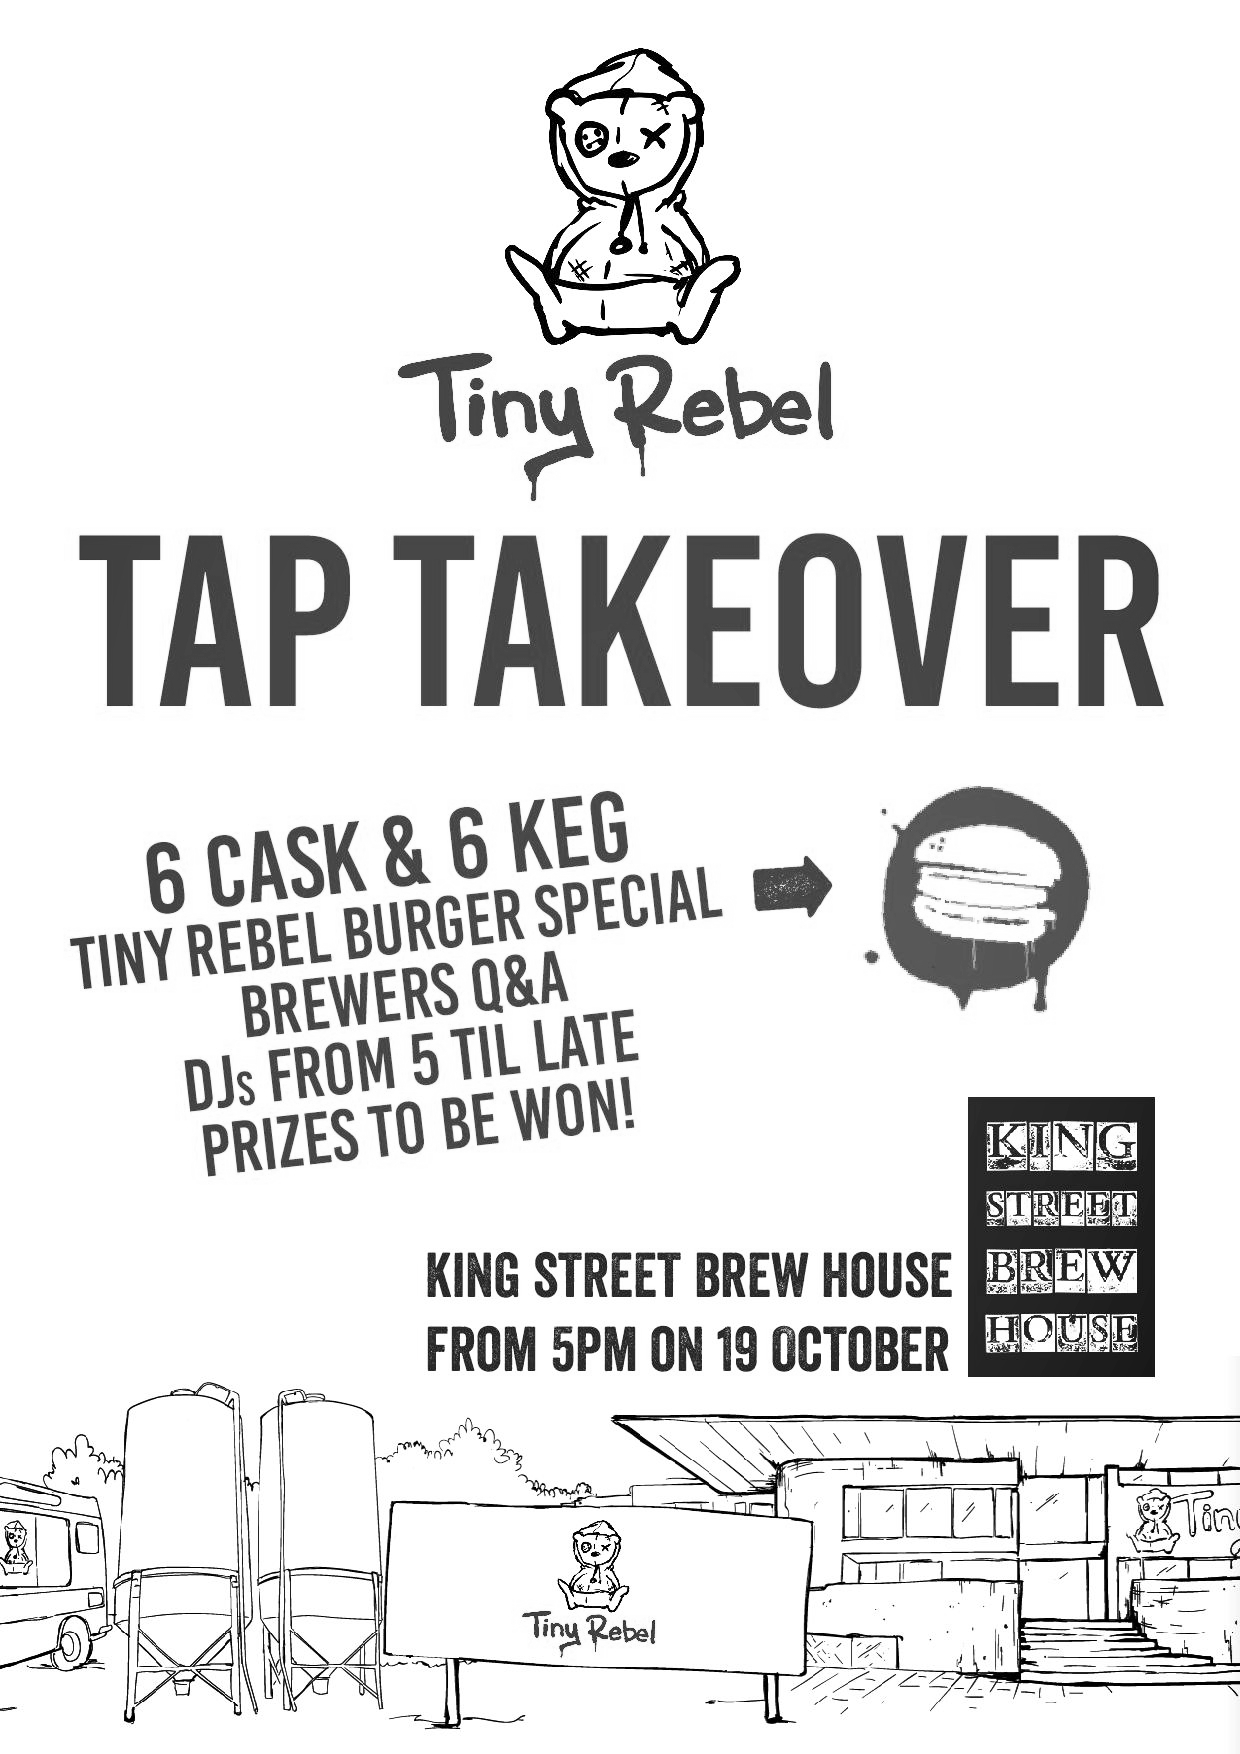 King Street Brewhouse - Tiny Rebel tap takeover.jpg